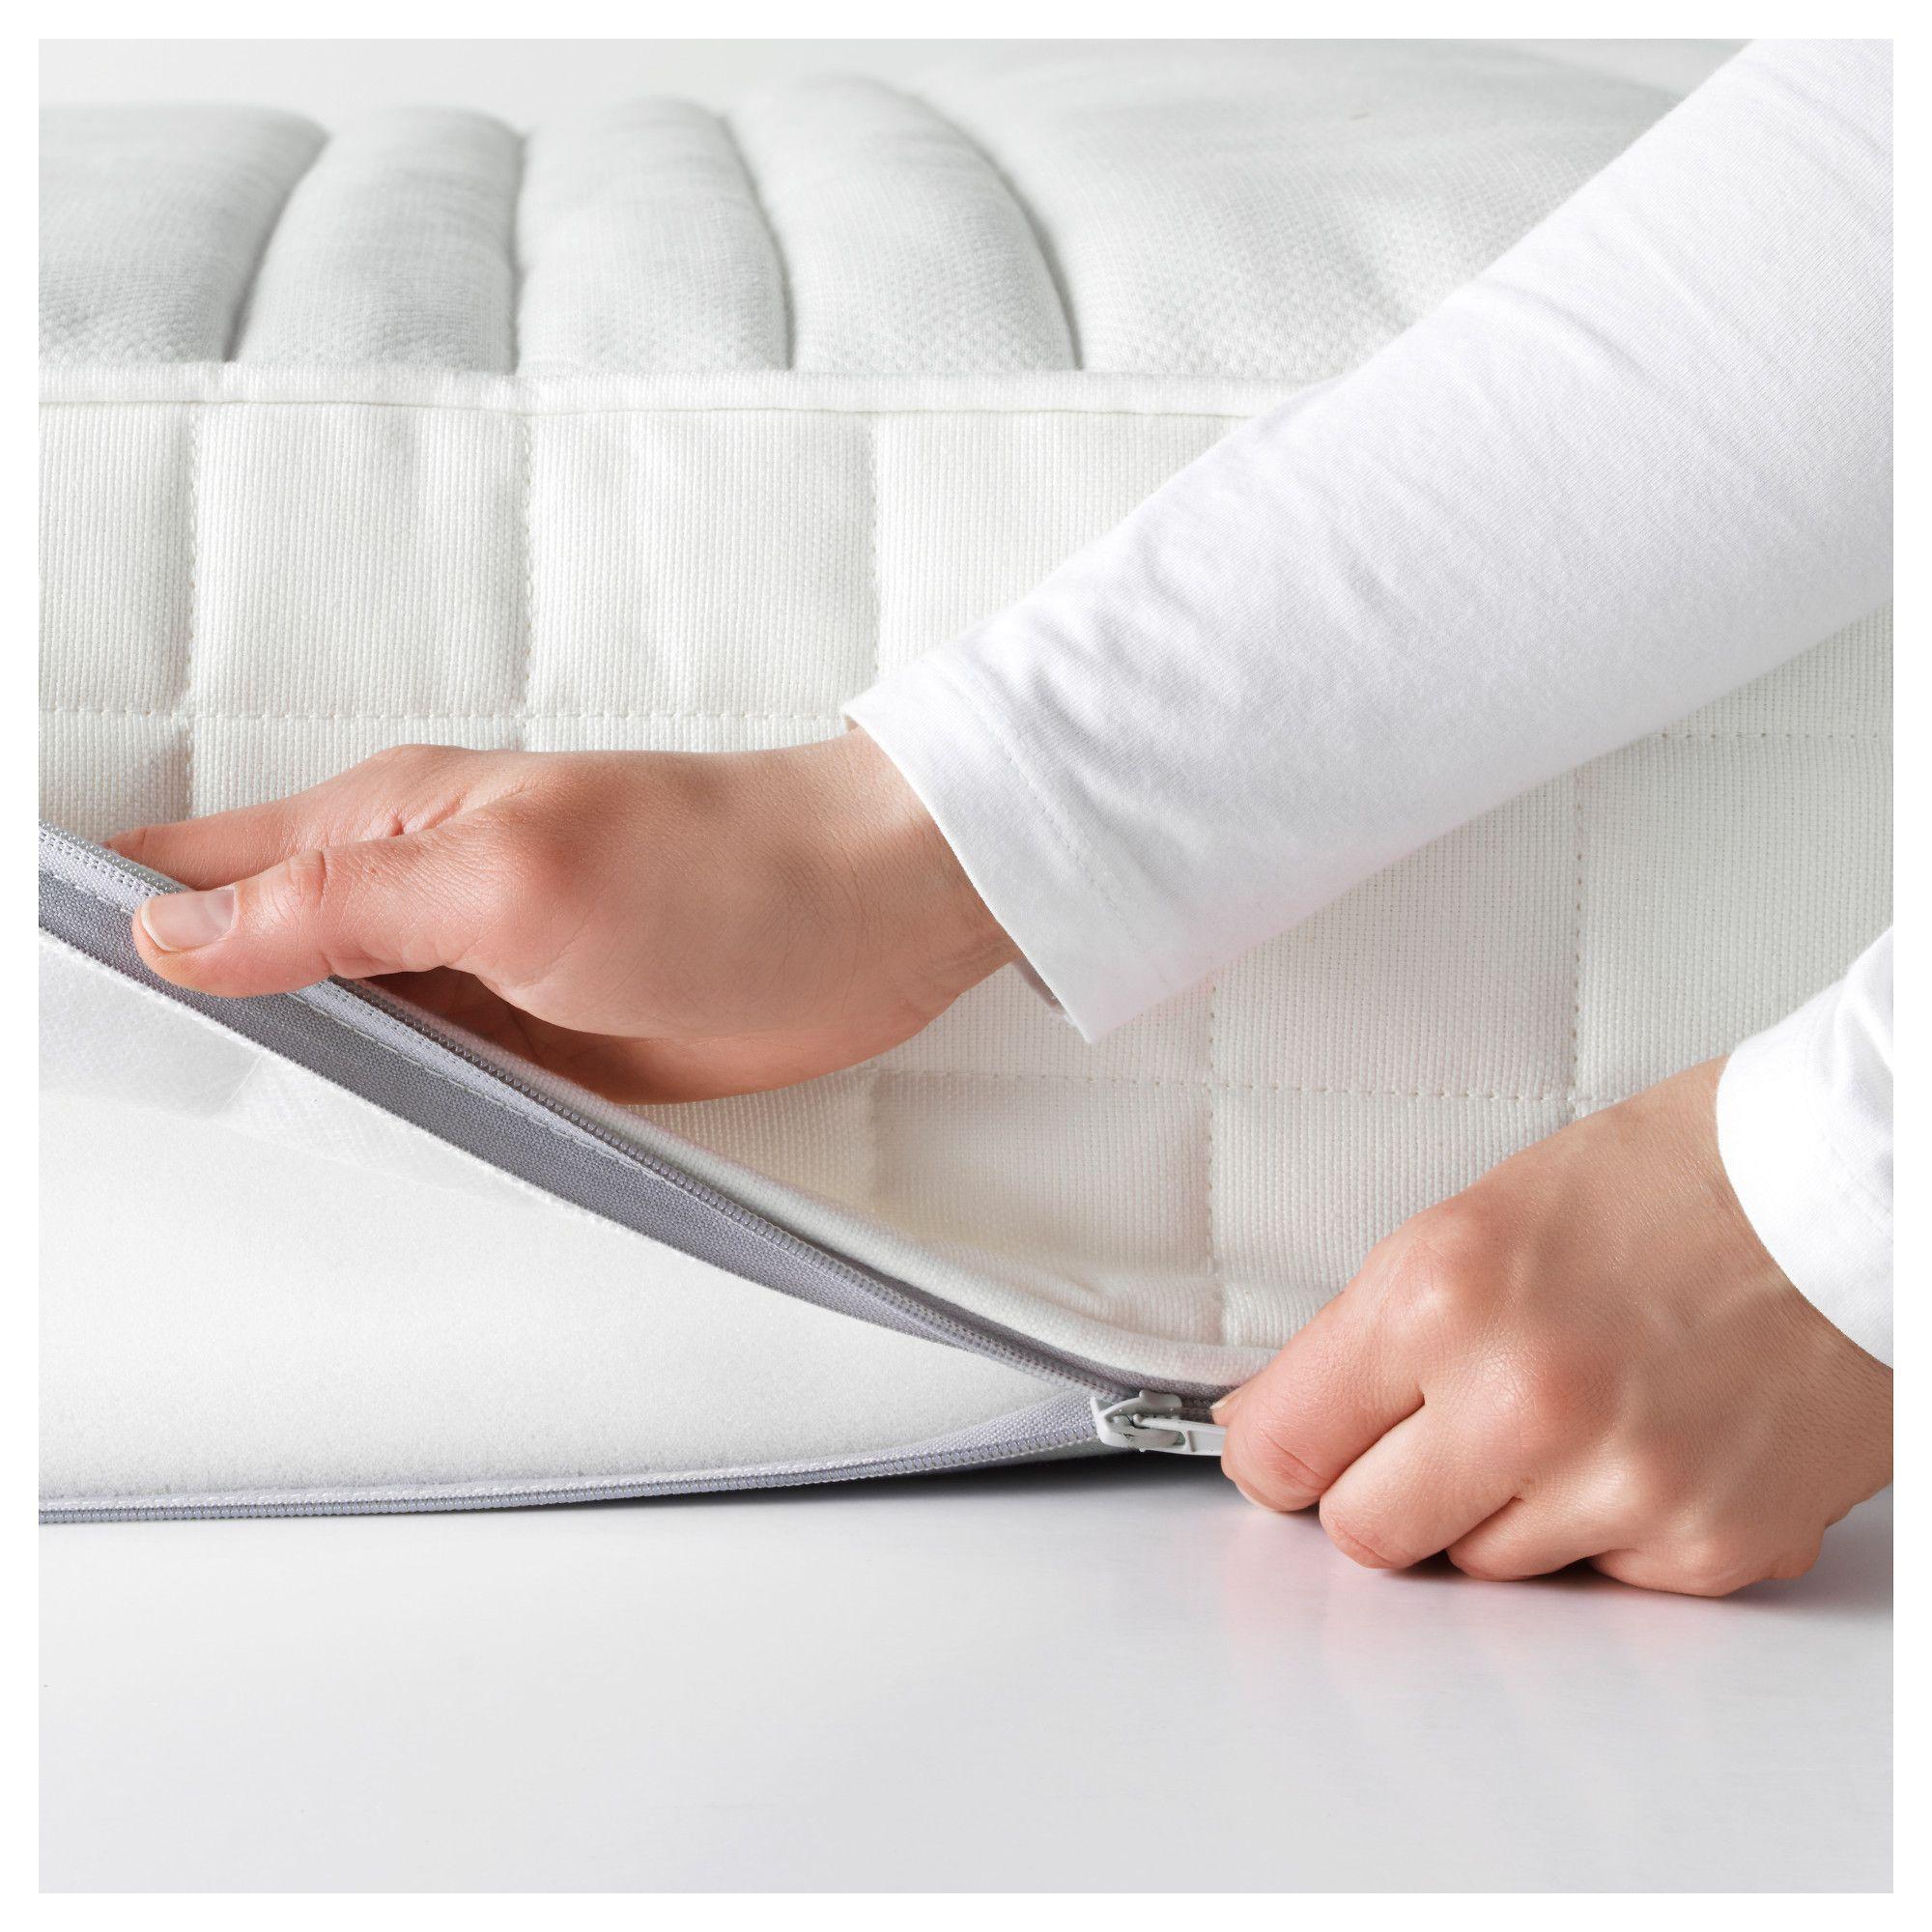 ikea matrand latex mattress medium firm white latex mattress